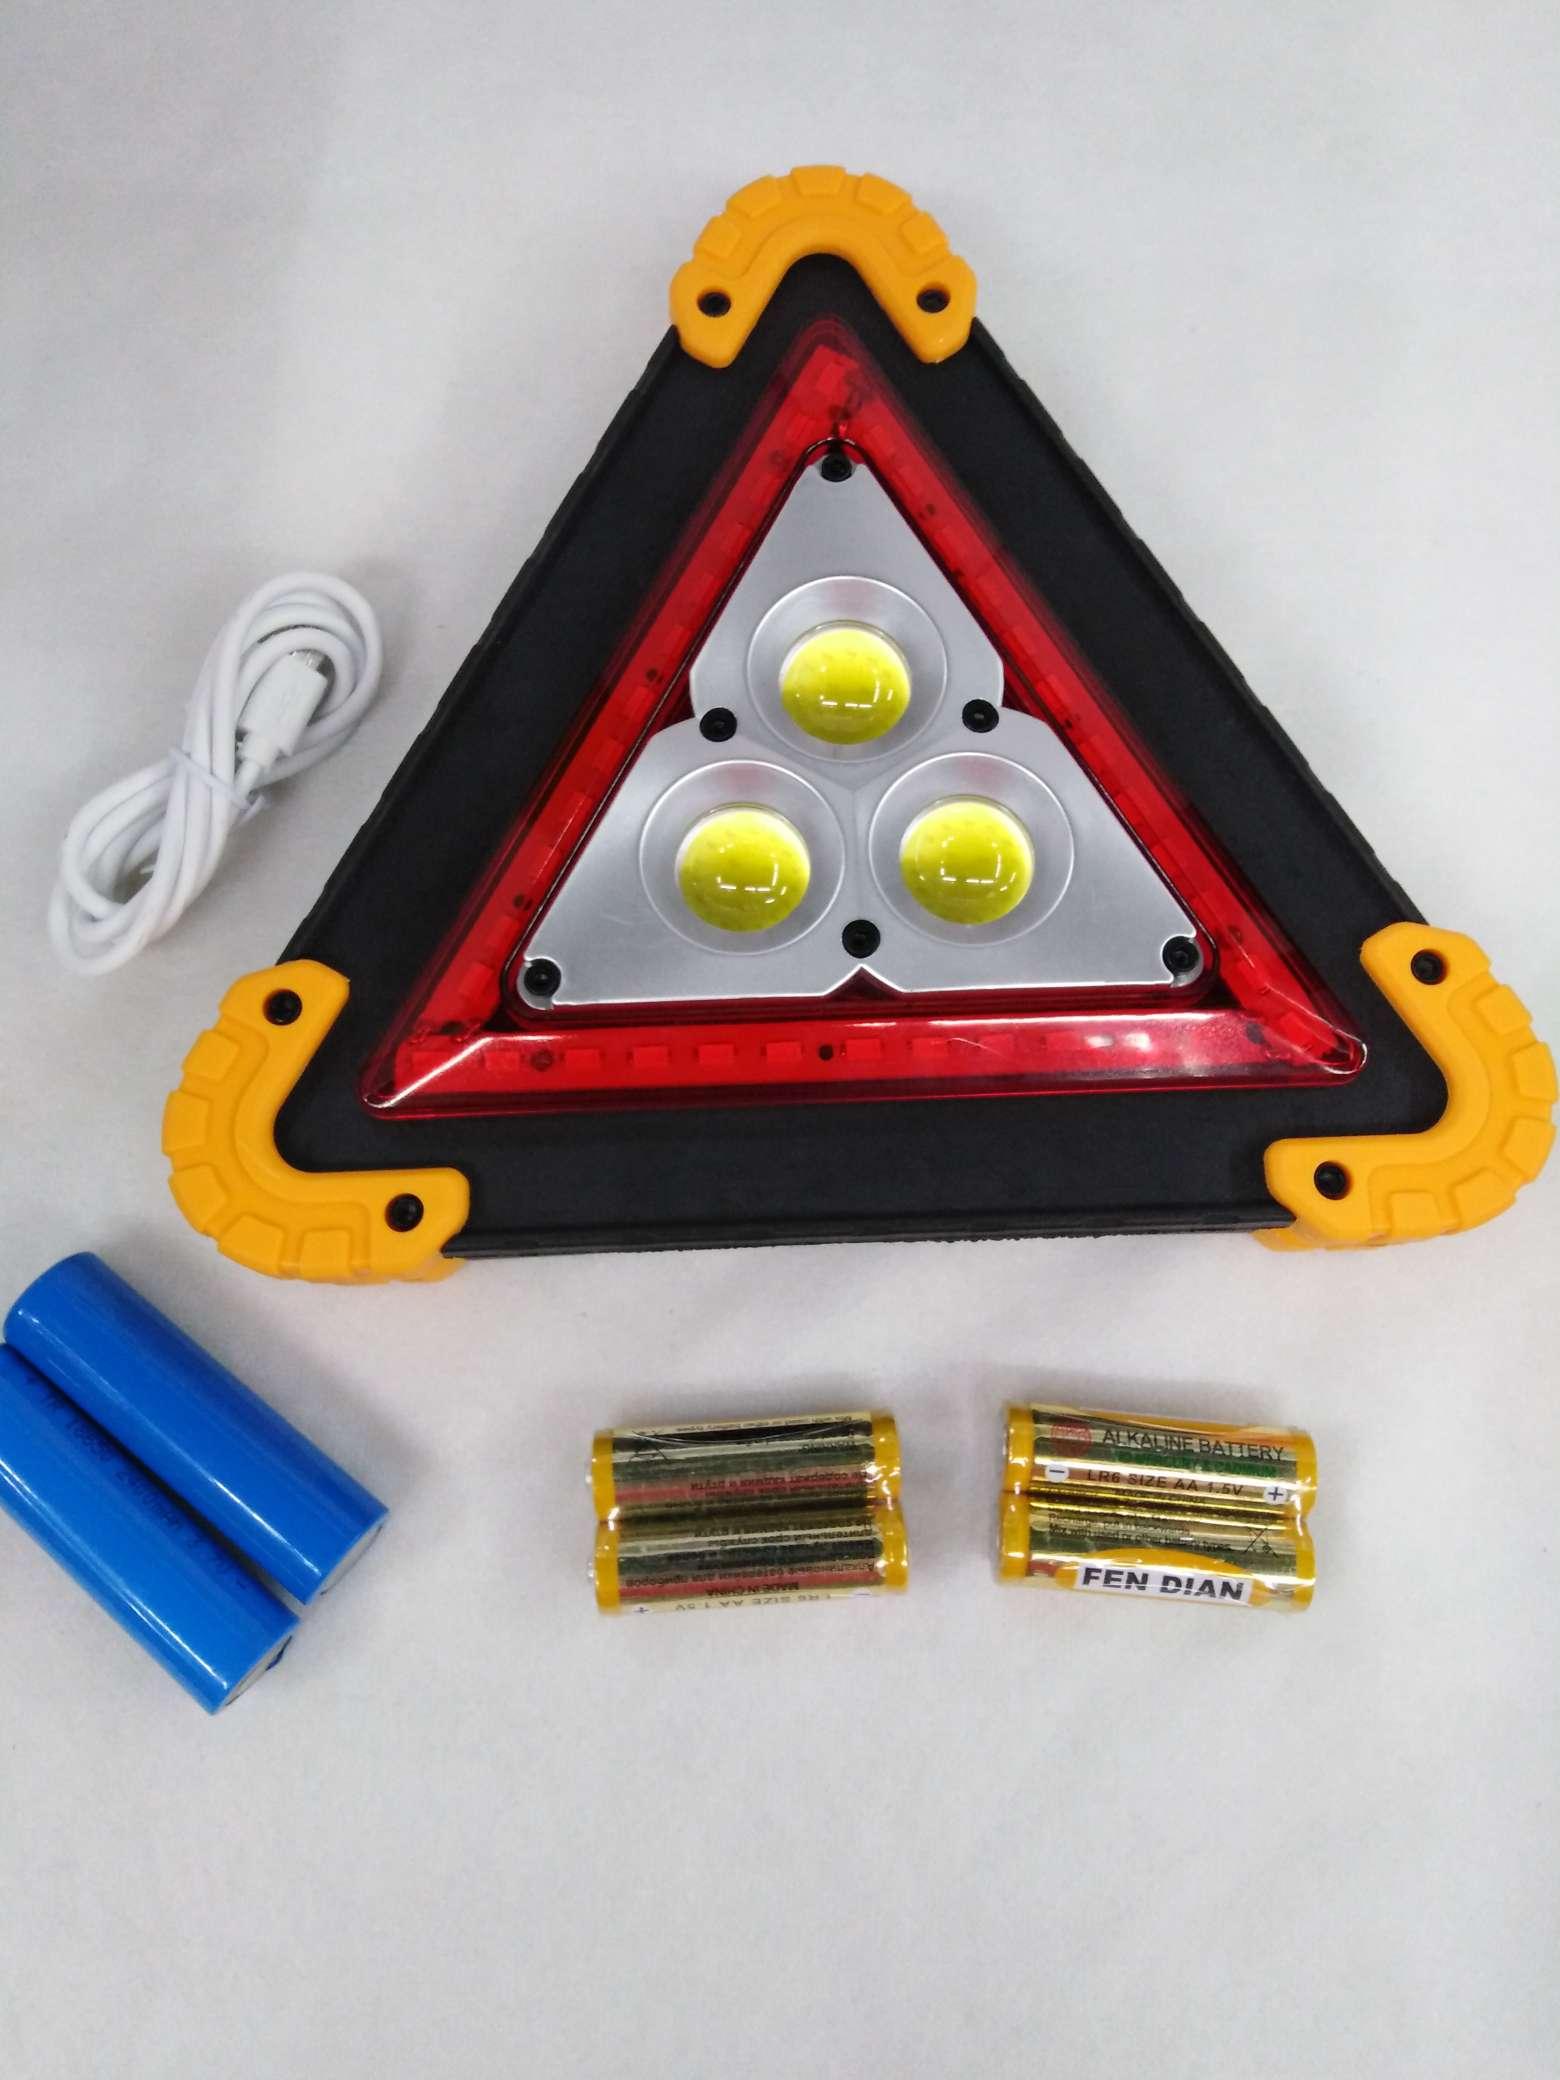 W838三角牌警示灯,灯泡:3个COB十36颗贴片灯珠,功率50W,功能:強弱贴片十(红闪),一件48个起批